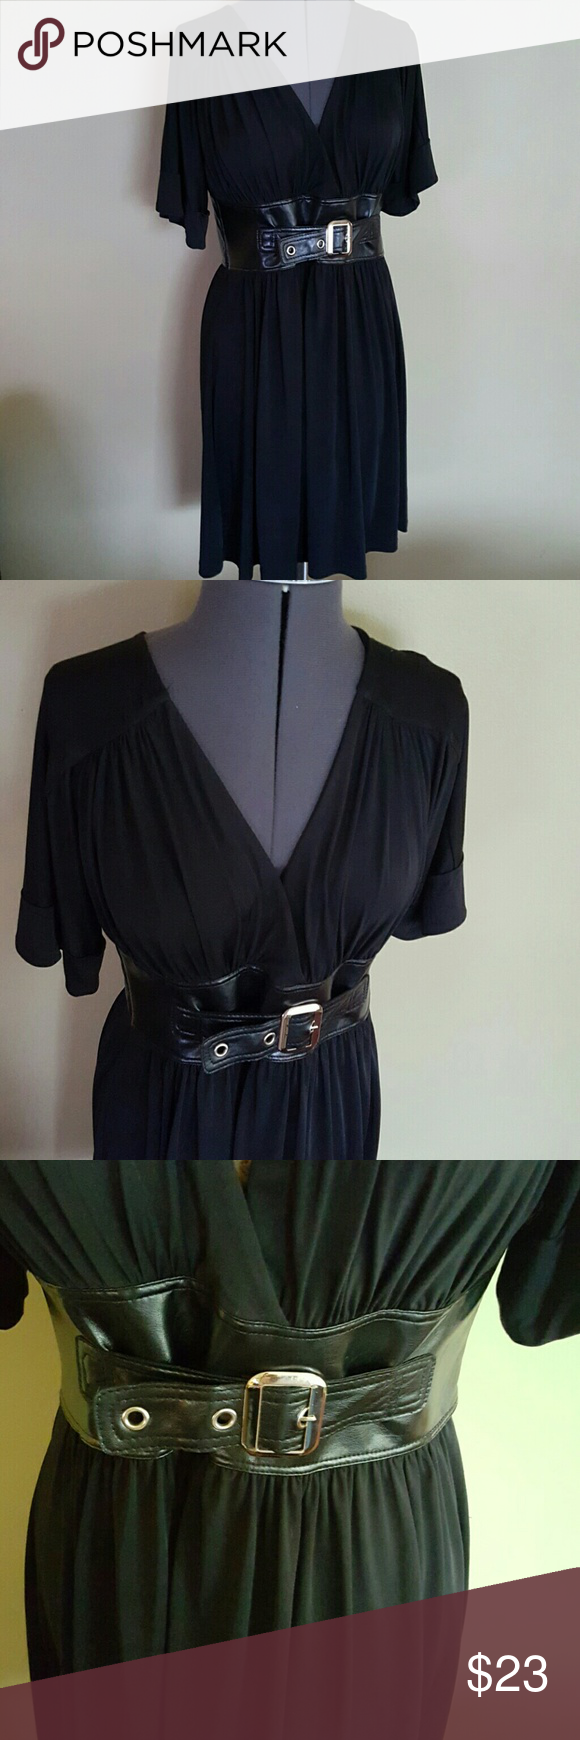 "Allen B Black Deep V Dress Black Allen B. Dress with adjustable black belt.  Short sleeve above or at knee length dress.  Size Medium.  Polyester and Spandex. Length: 34"", Chest: 34/36"", Waist: 28/29"". Allen B Dresses Midi"